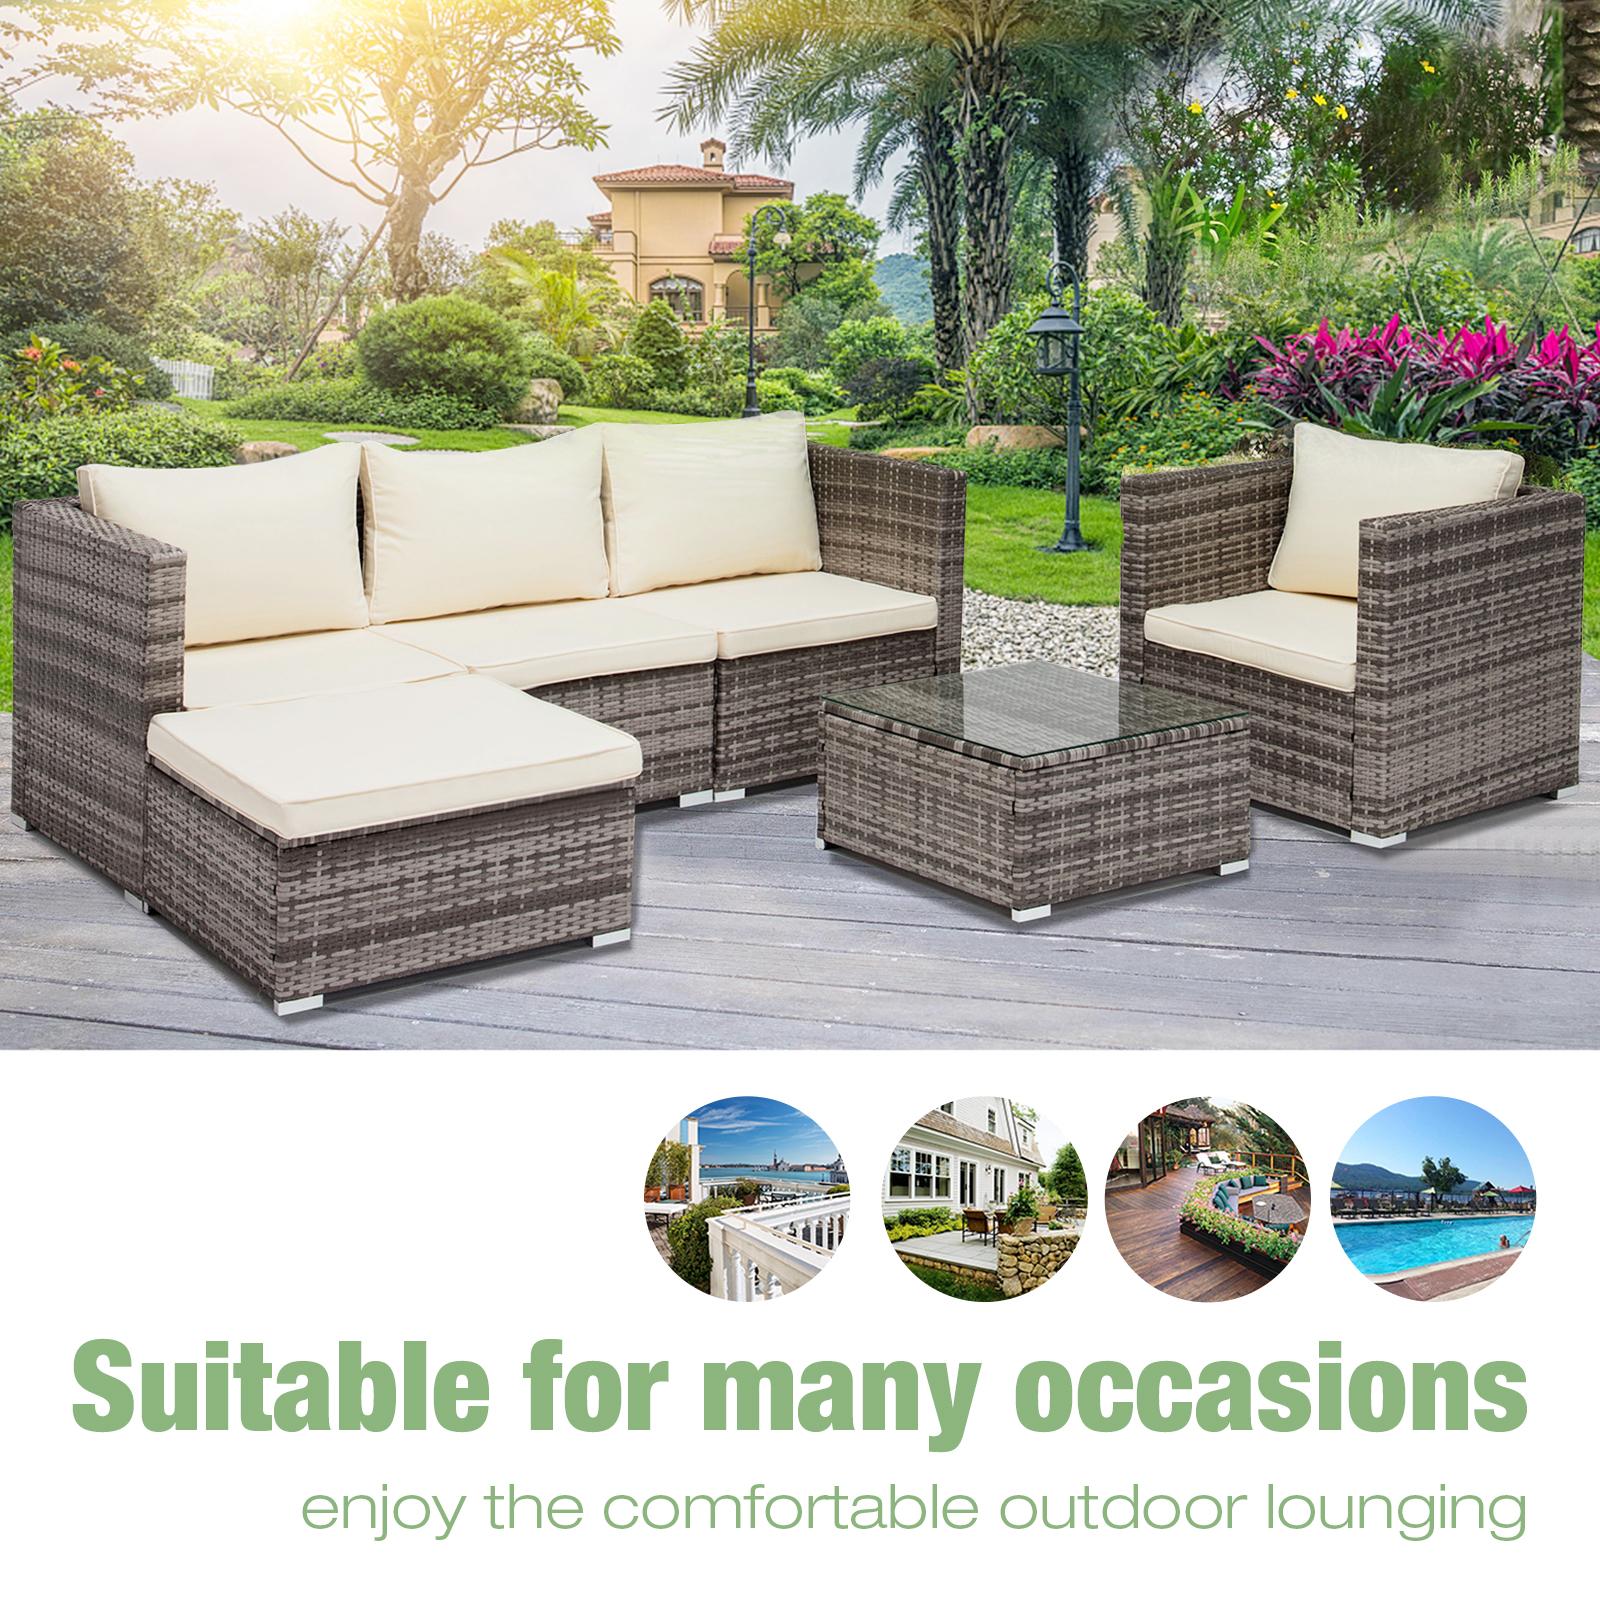 Uenjoy 6PC Rattan Wicker Outdoor Funiture Set Sectional Garden Sofa,Gray